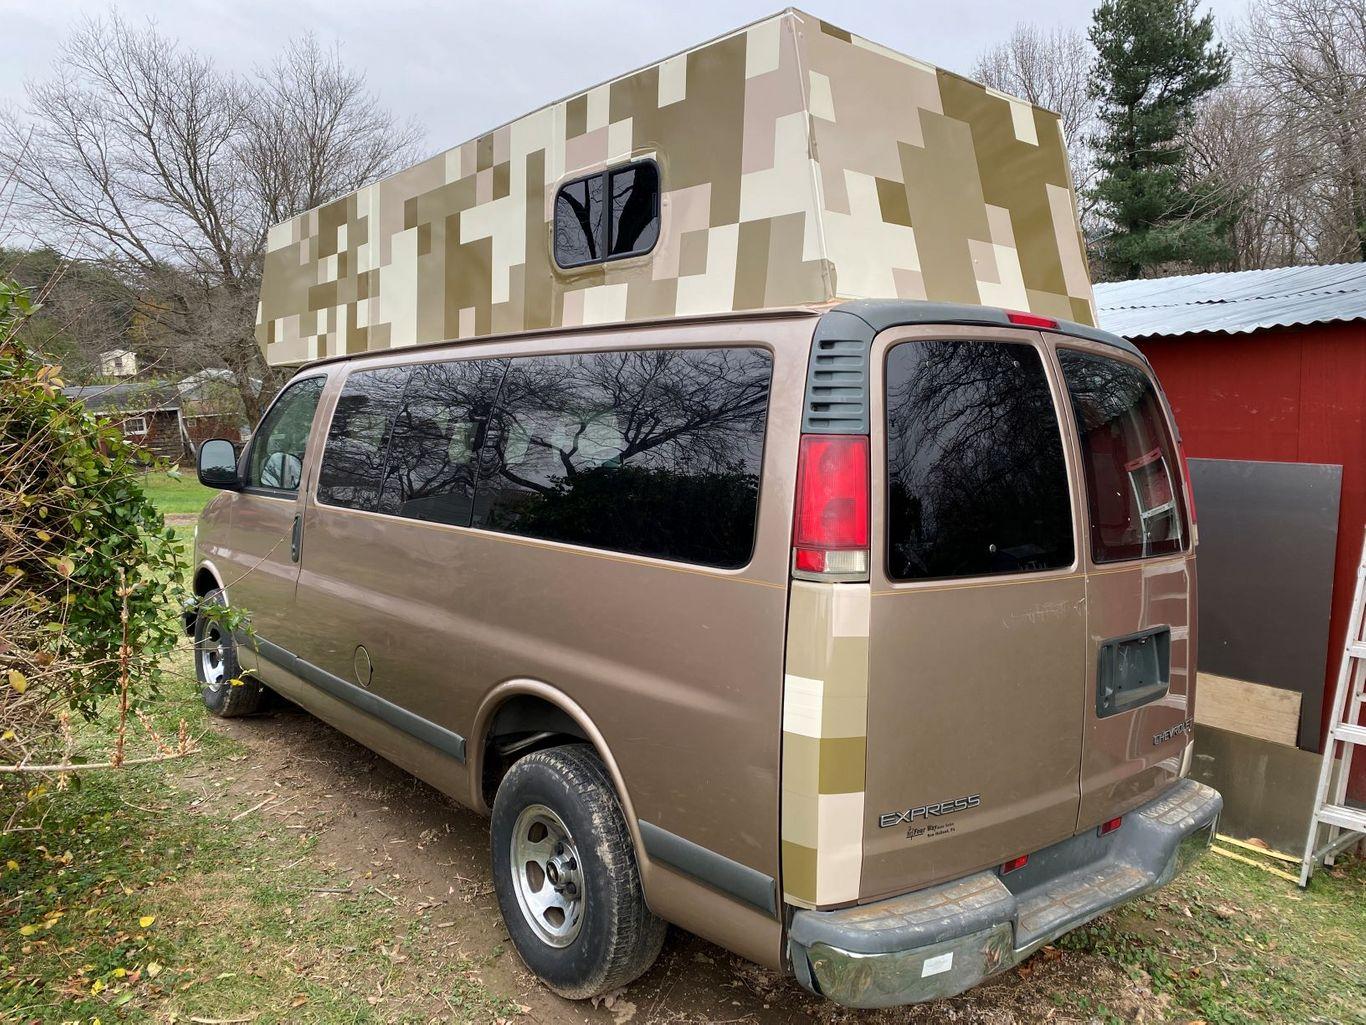 Chevy Express Van Camper Conversion